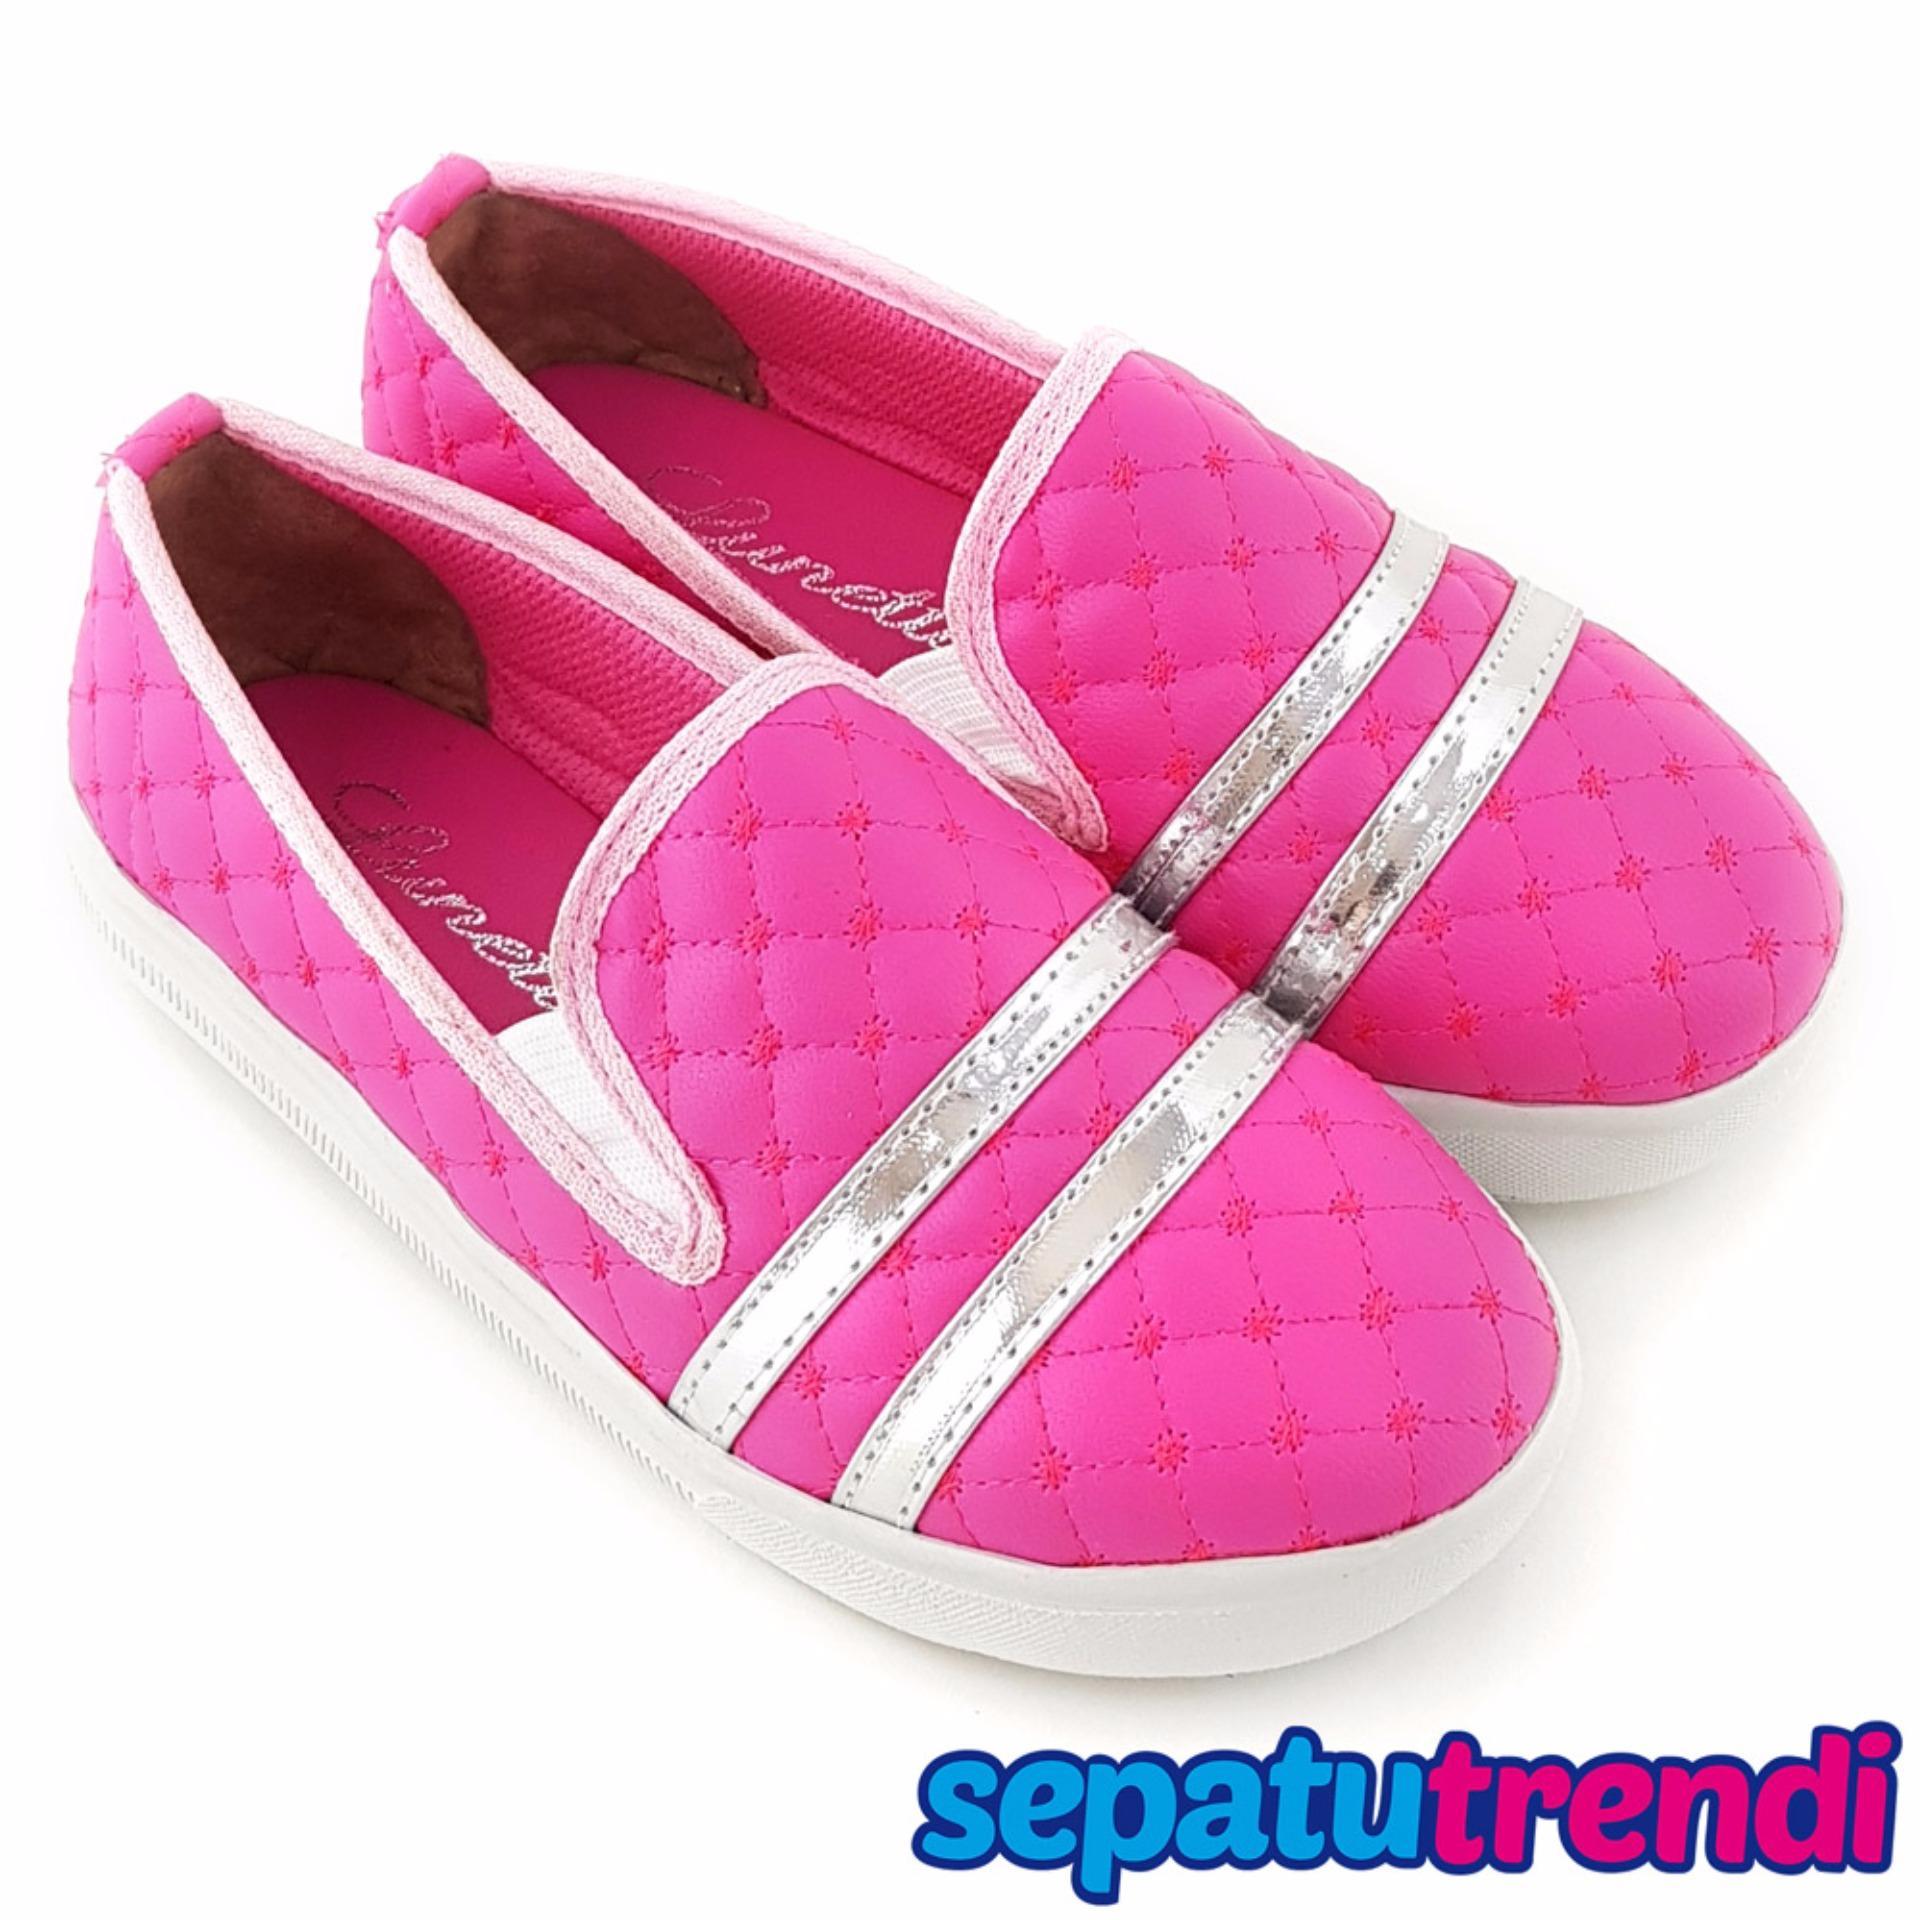 Jual Trendishoes Sepatu Anak Perempuan Slipon Elegan 07Rd Fuchsia Trendishoes Grosir